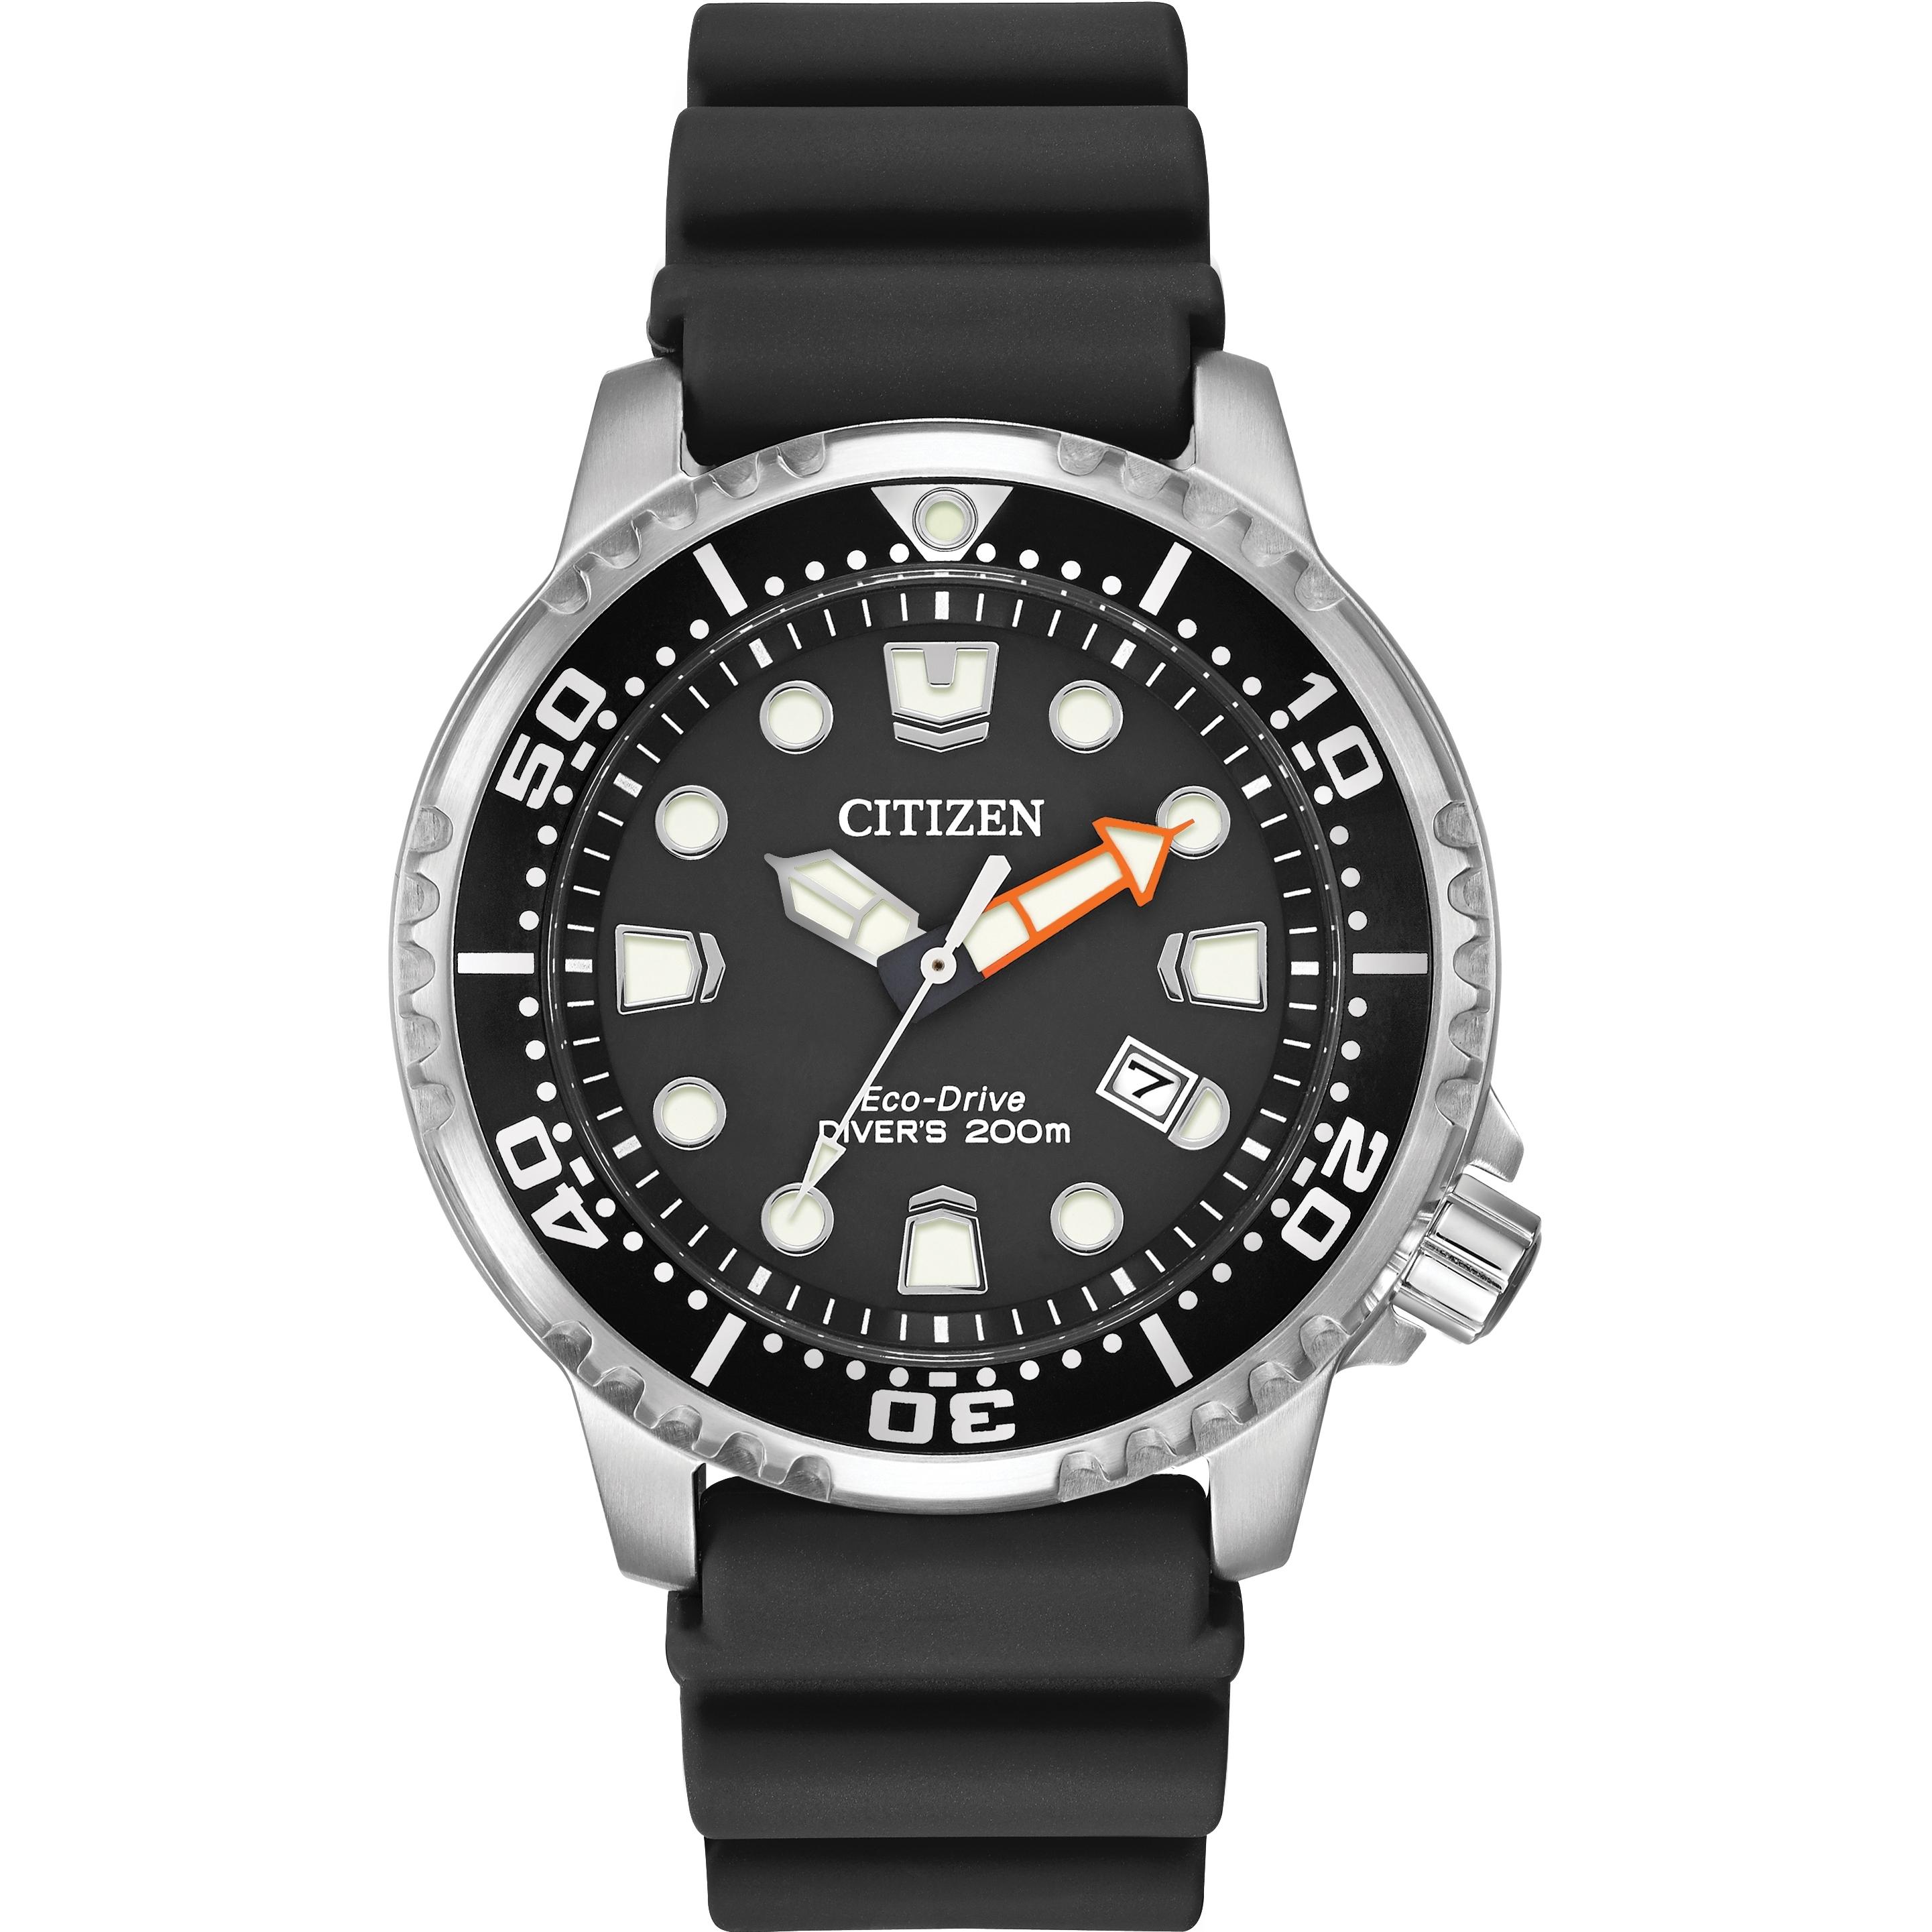 632e65a47 Gents Citizen Promaster Divers Watch (BN0150-28E)   WatchShop.com™